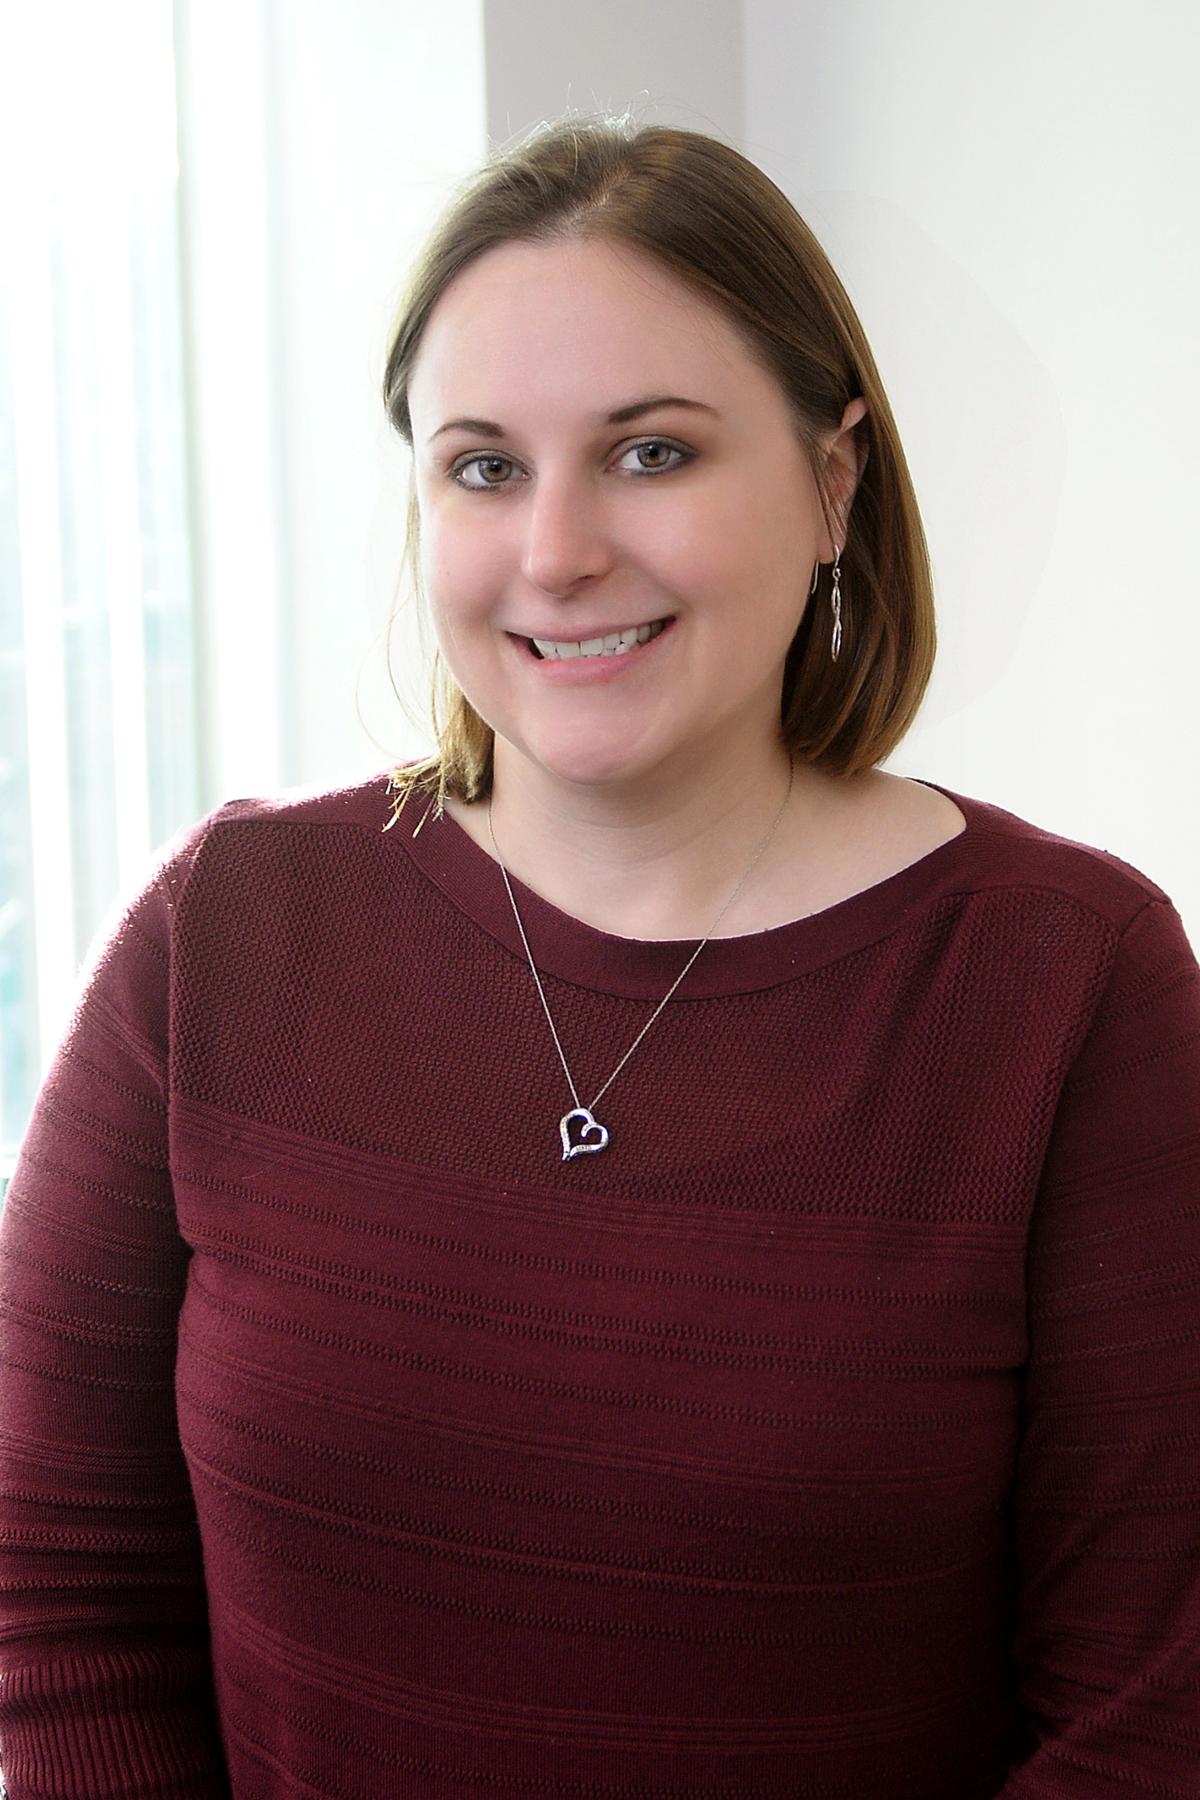 Christina O'Connell, Director